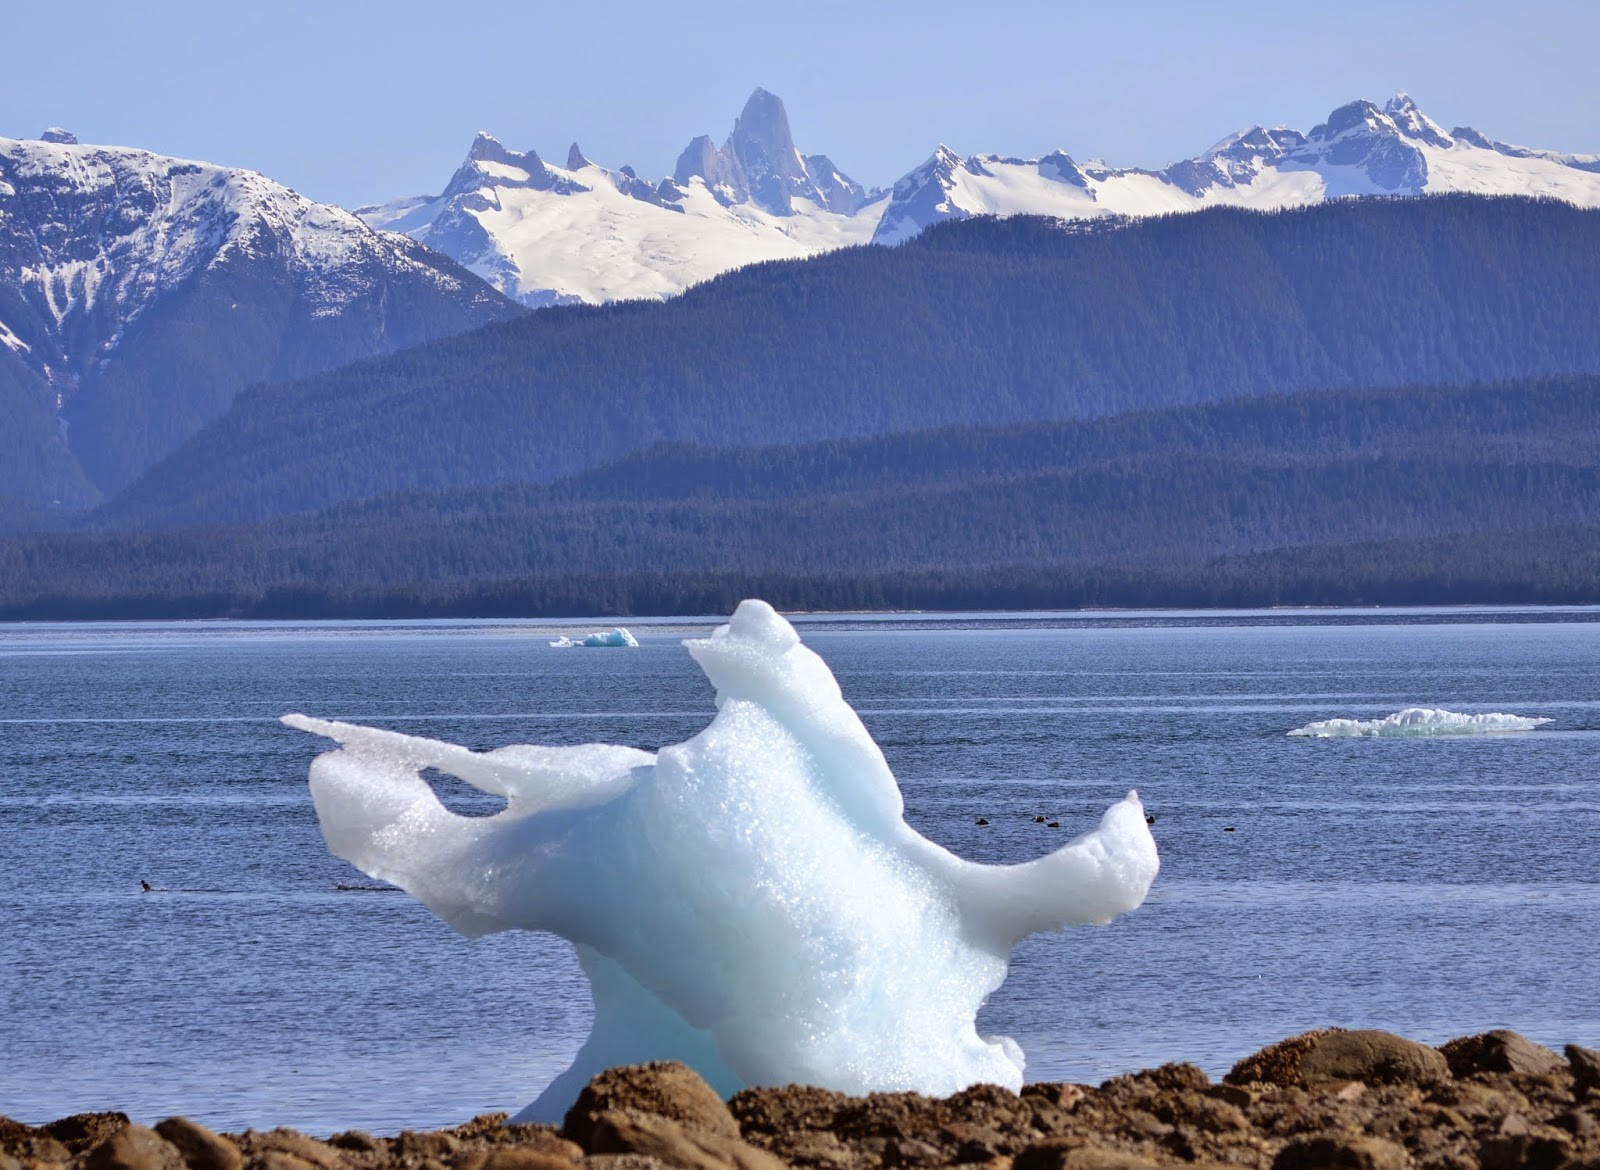 Run and Stitch - Alaskan icebergs